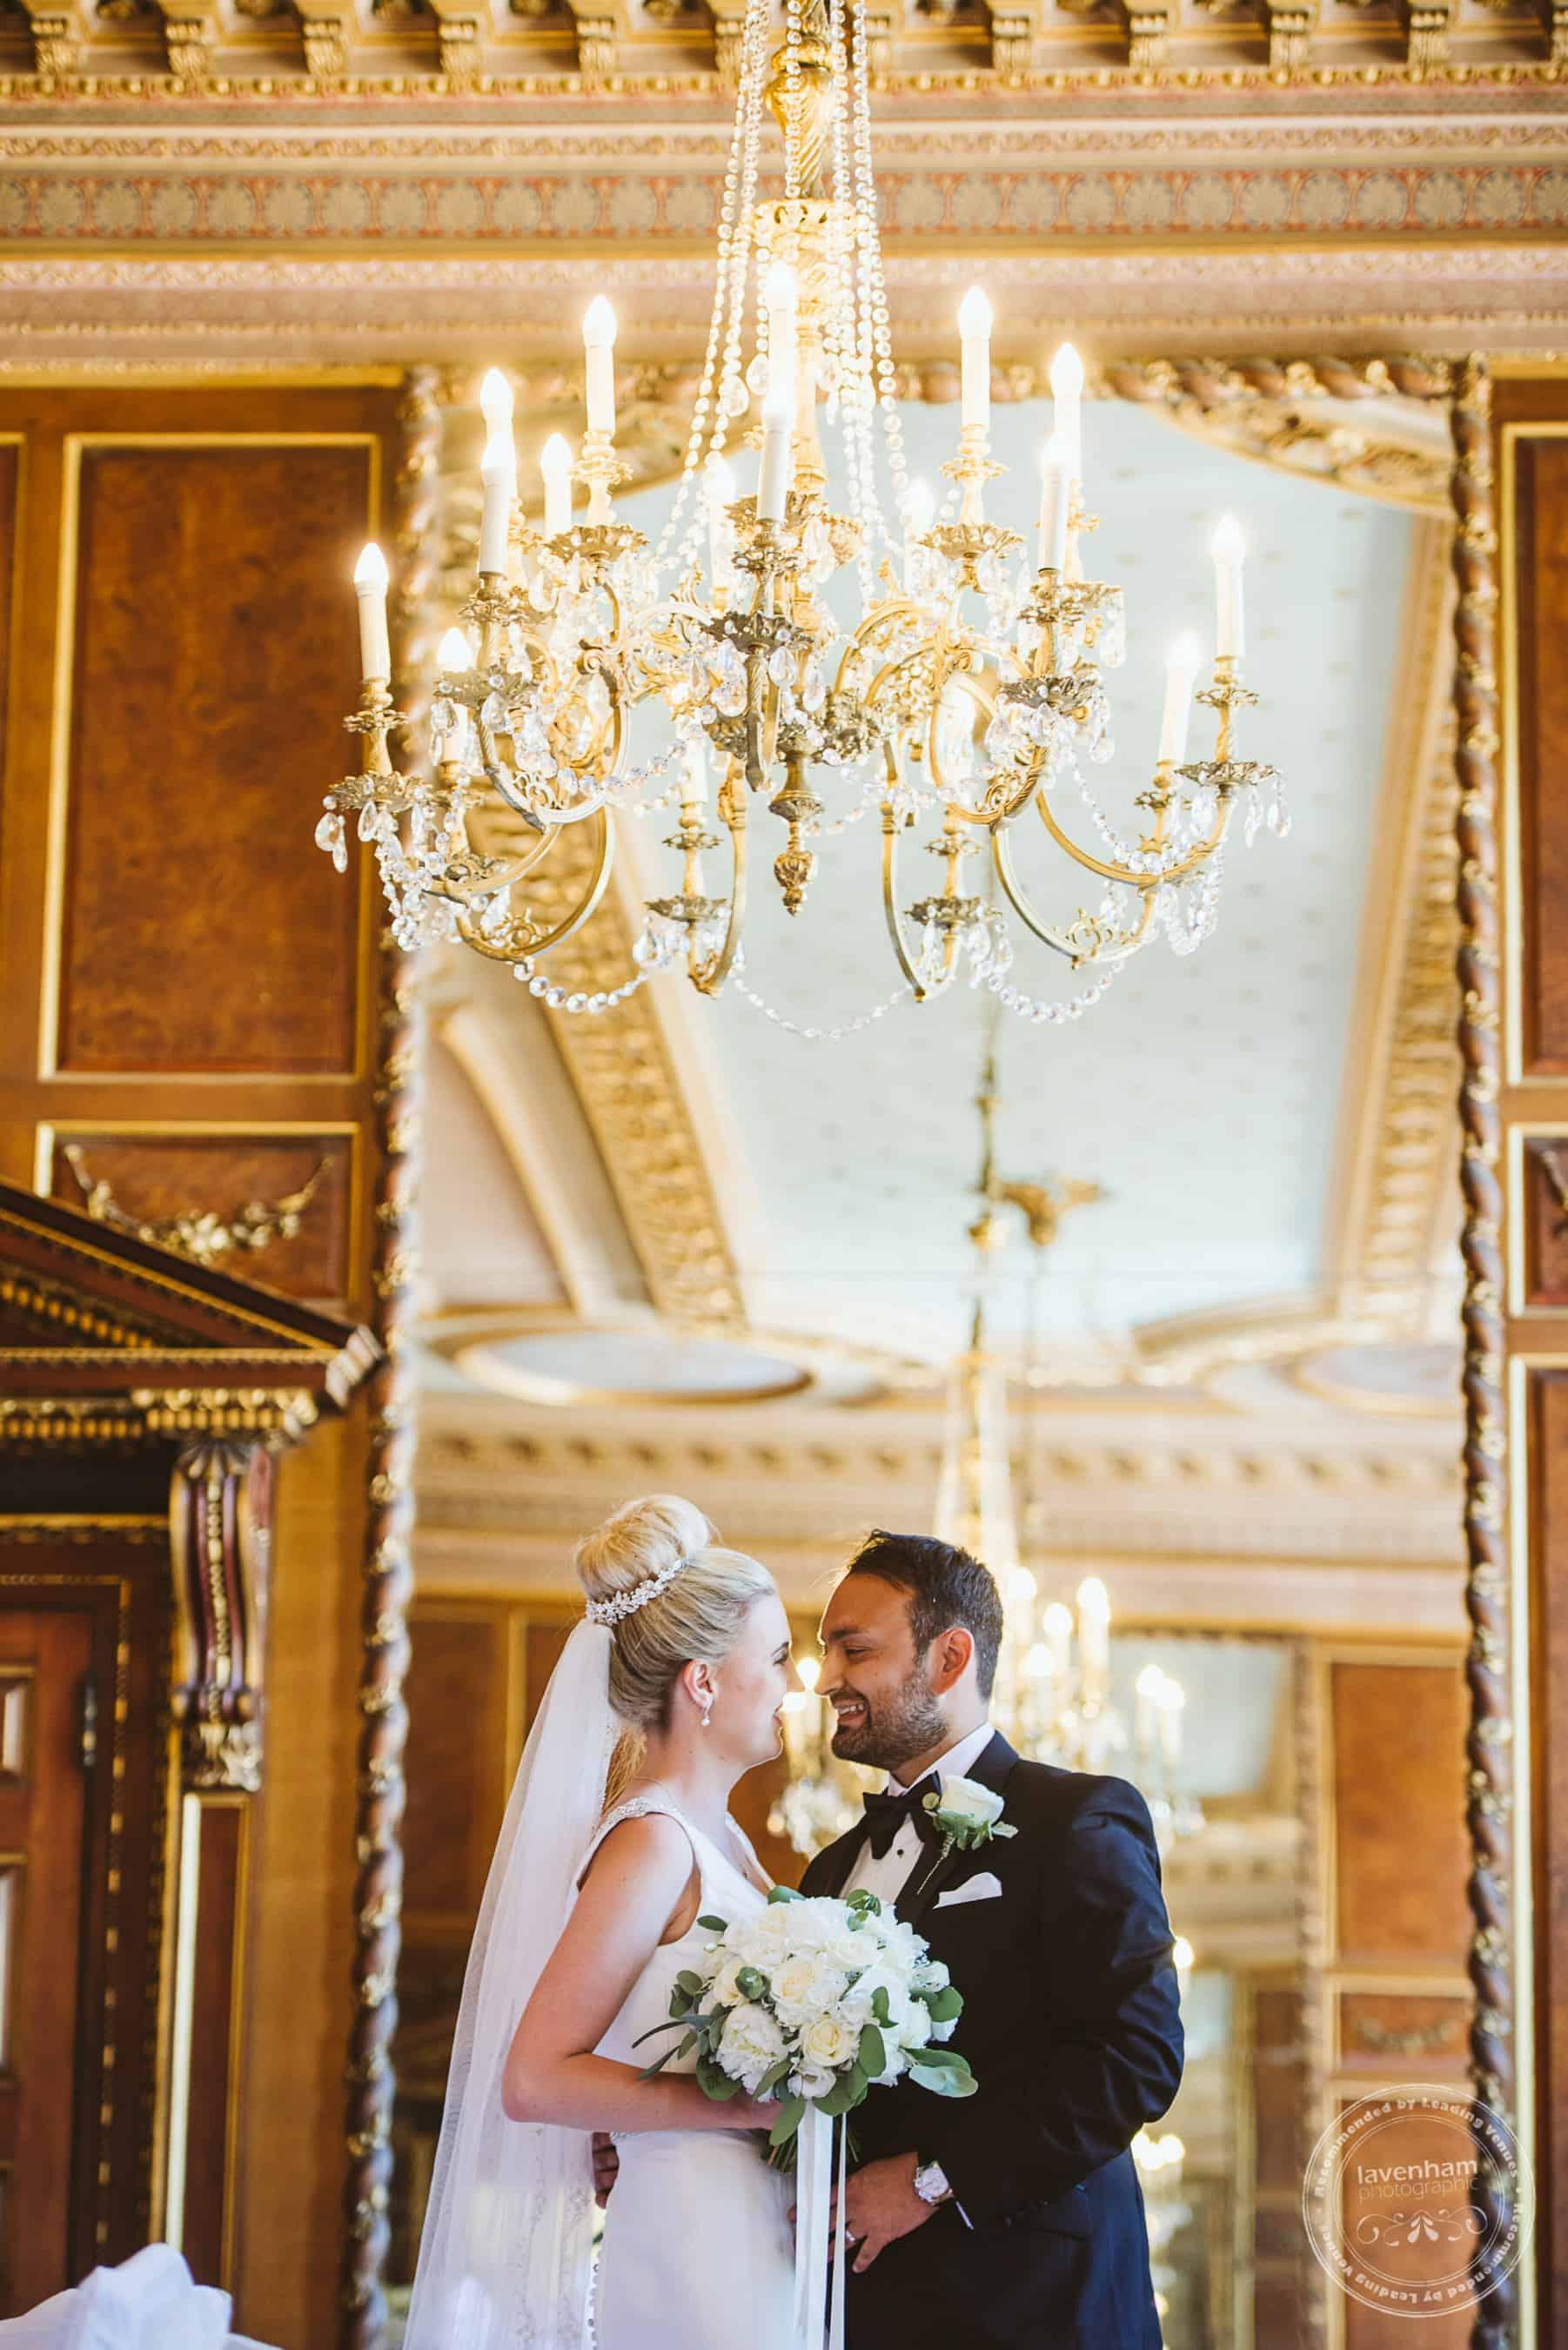 220618 Gosfield Hall Wedding Photography Lavenham Photographic 0143